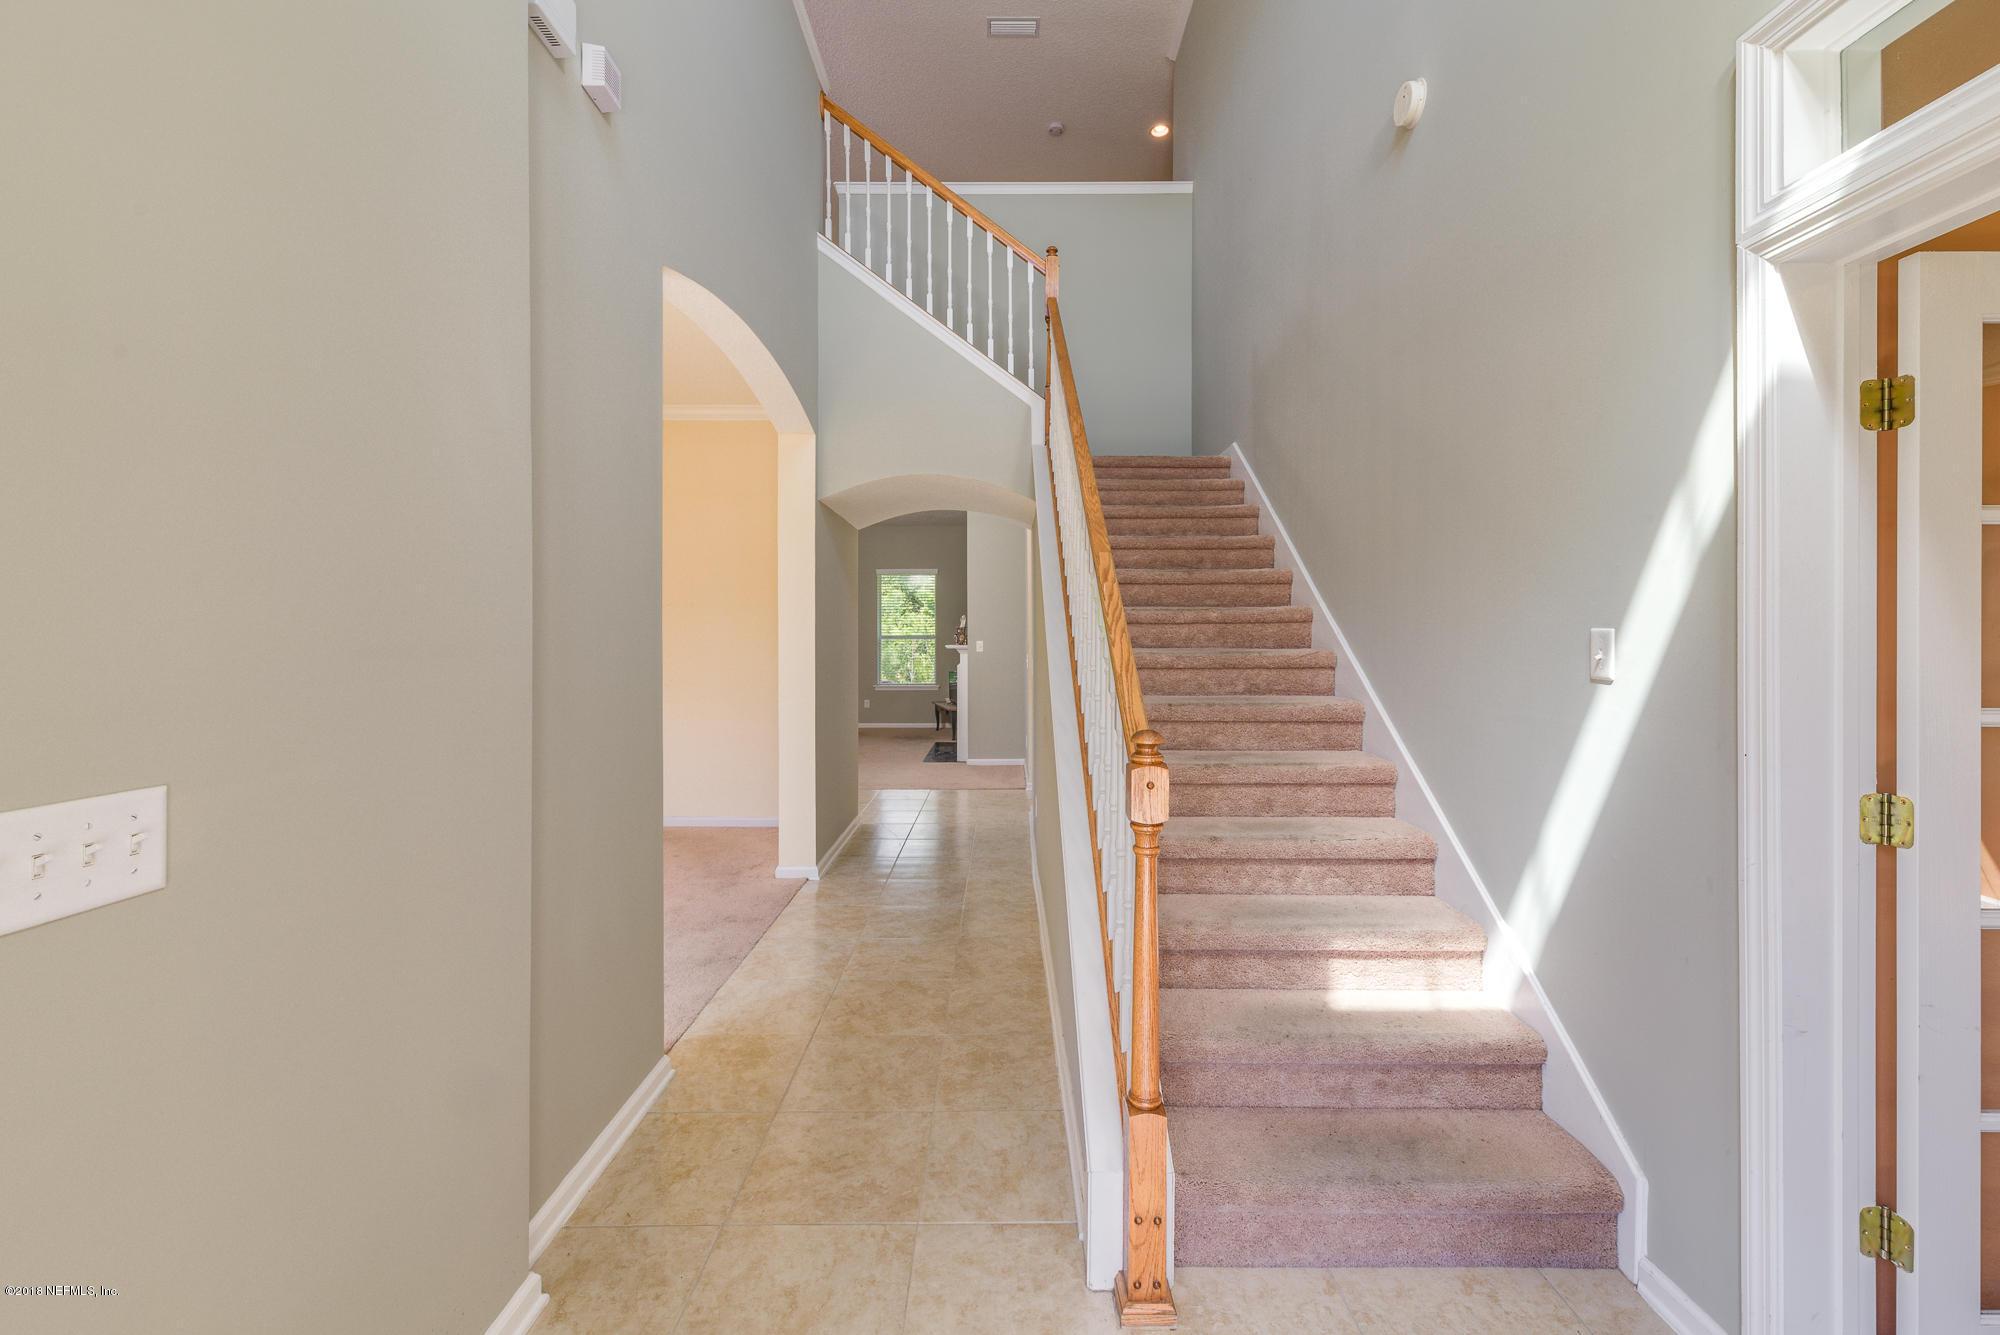 283 SOPHIA, ST AUGUSTINE, FLORIDA 32095, 5 Bedrooms Bedrooms, ,3 BathroomsBathrooms,Residential - single family,For sale,SOPHIA,941911